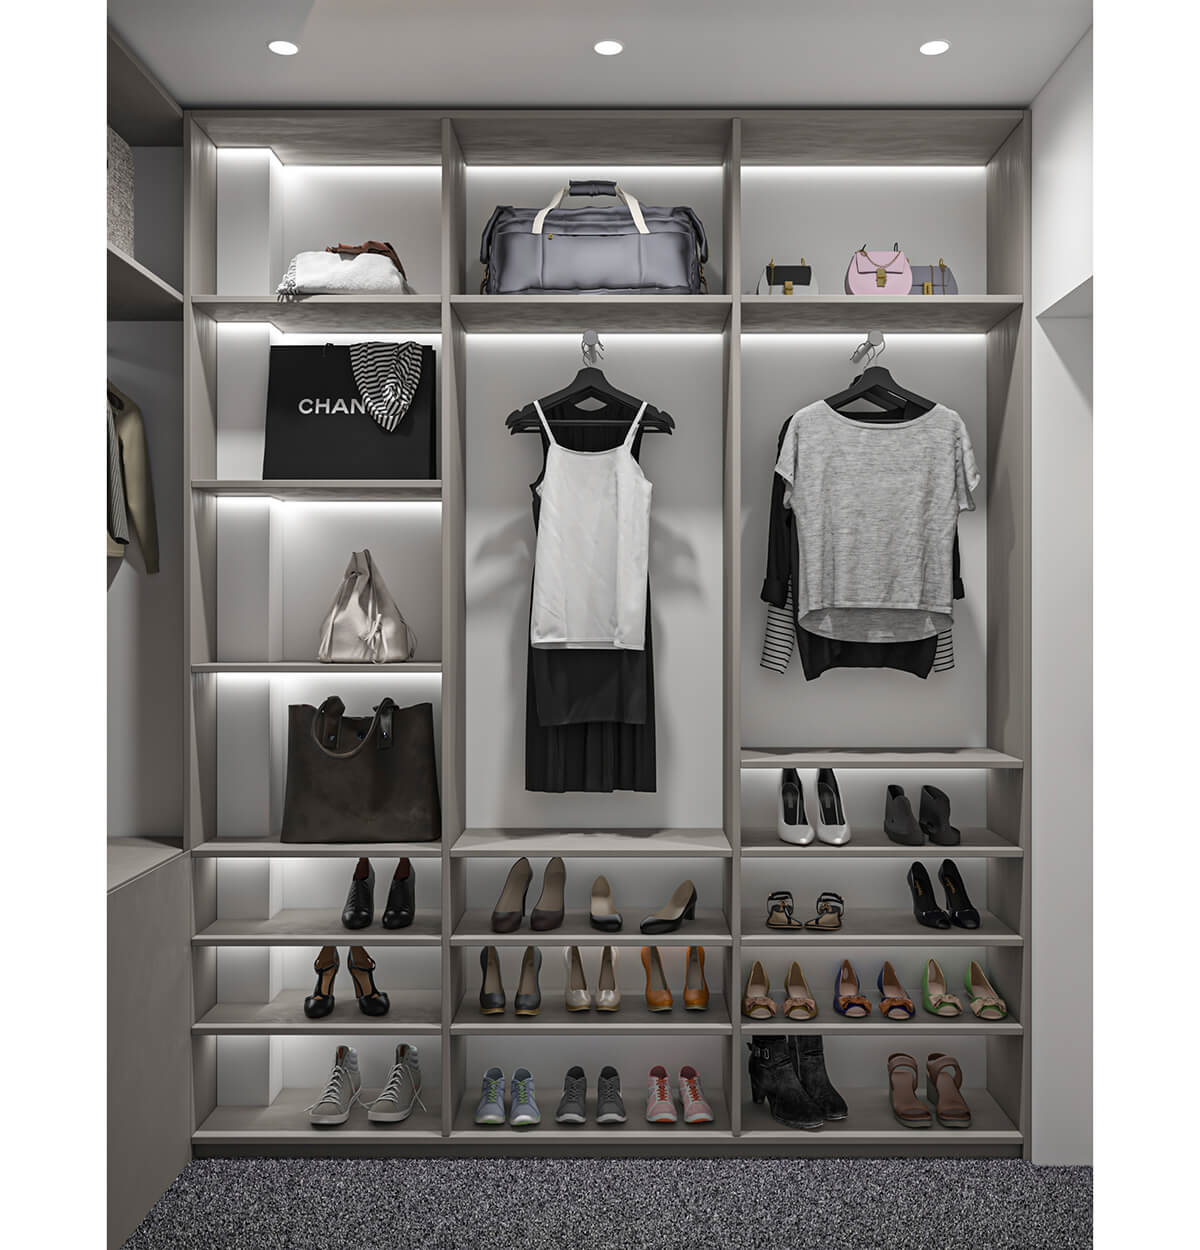 interioren-dizain-proekt-na-garderobna-emma